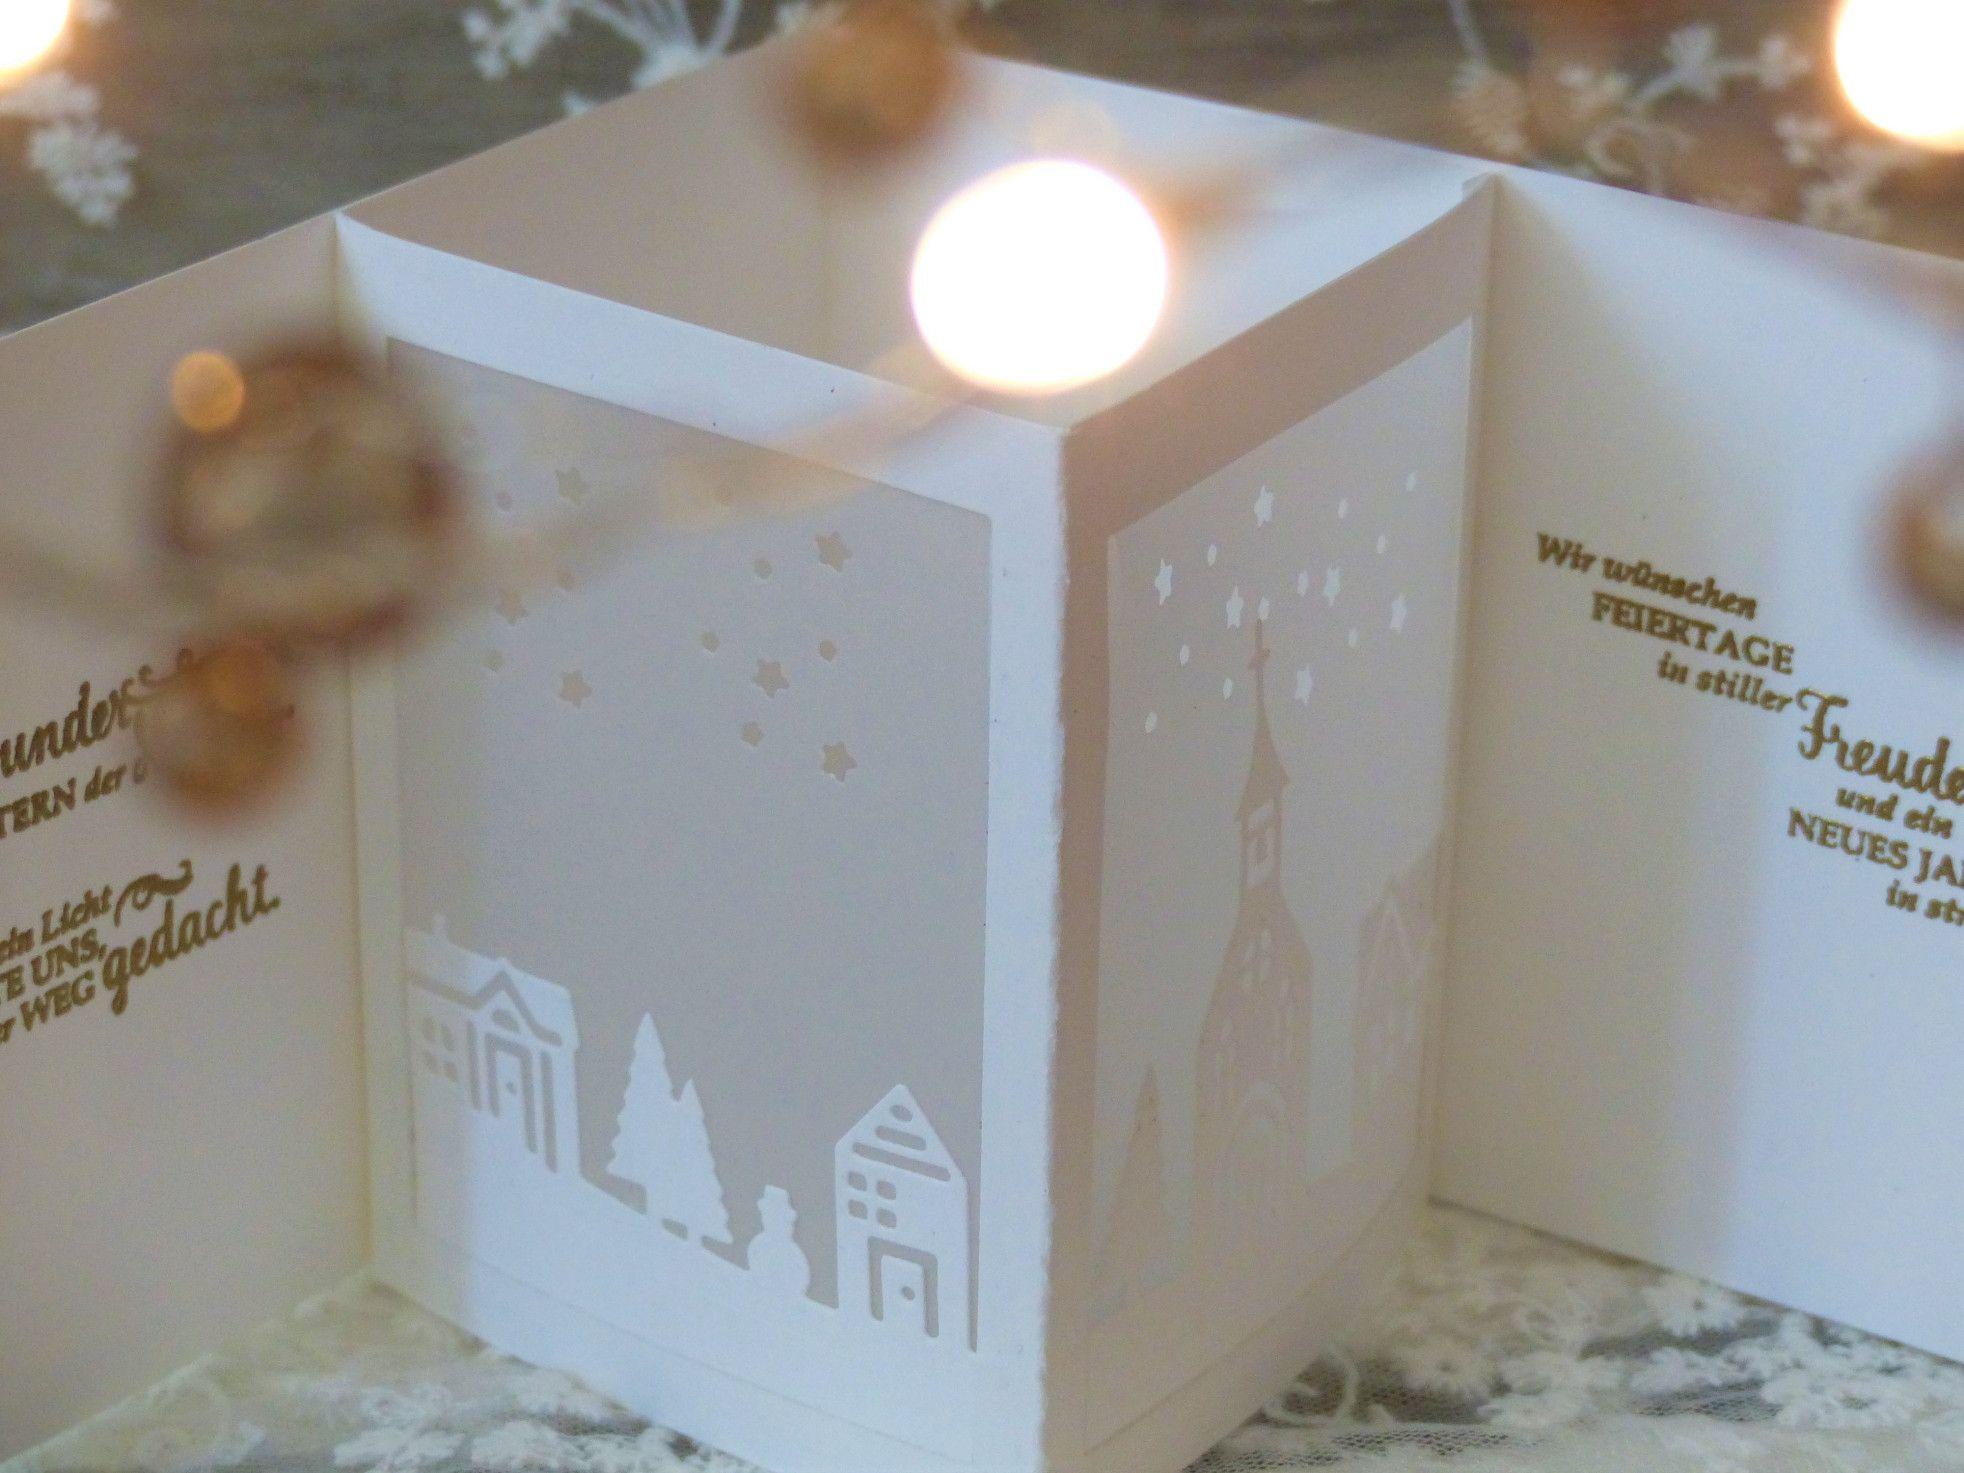 unabh ngige stampin 39 up demonstratorin greeting cards. Black Bedroom Furniture Sets. Home Design Ideas